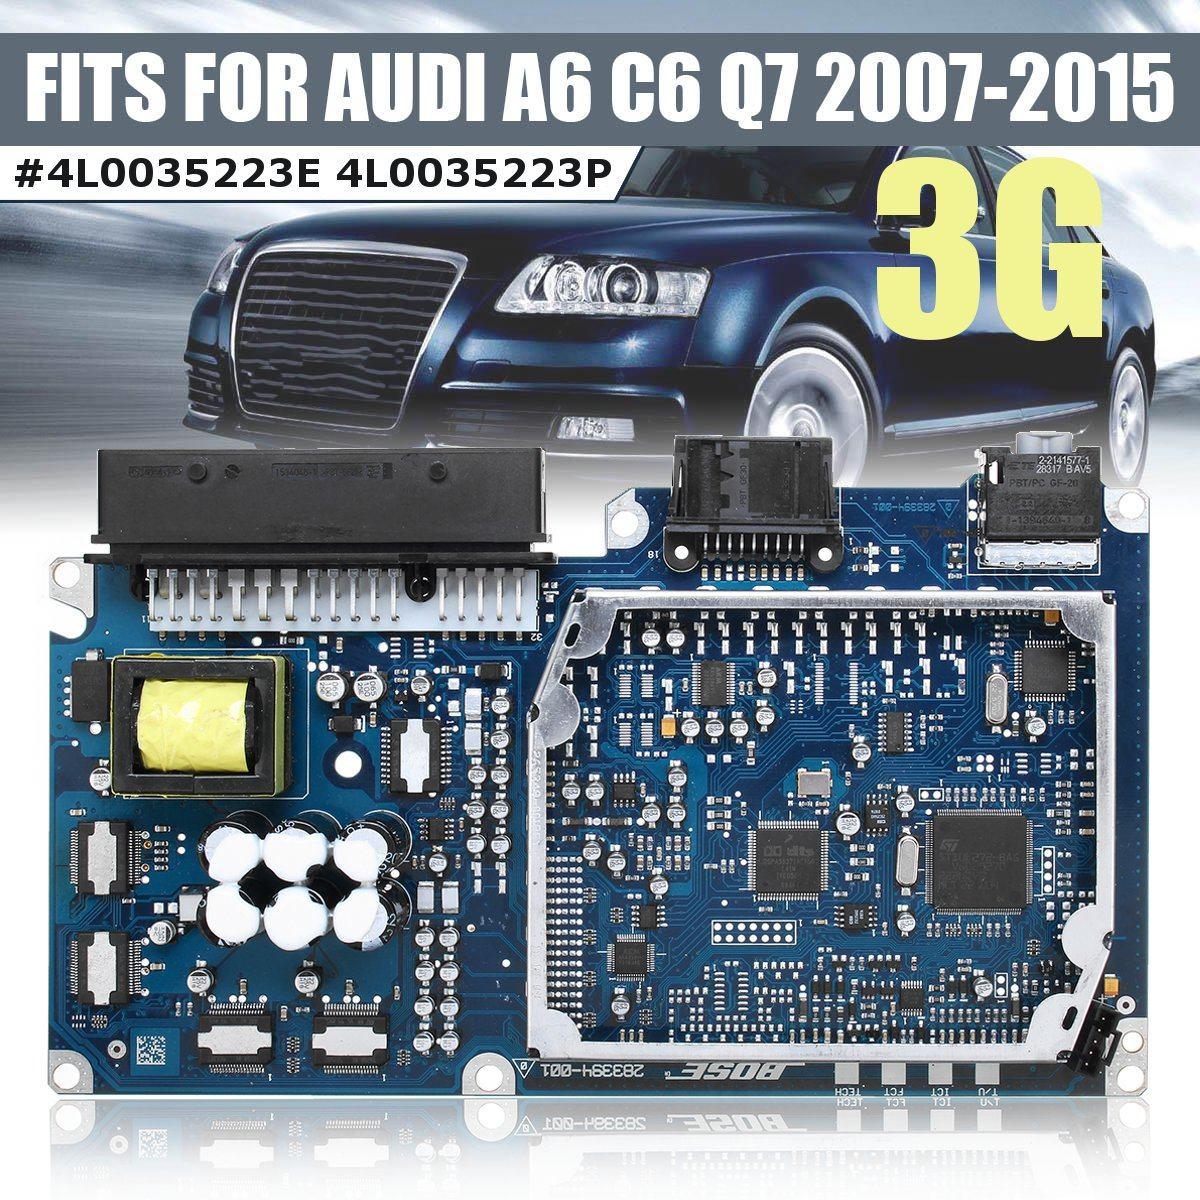 Optical Fiber Multimedia Power Amplifier Board 3g 2g For Audi A6 C6 Q7 2007 2008 2009 2010 2011 2012 2013 2014 2015 #4l0035223p